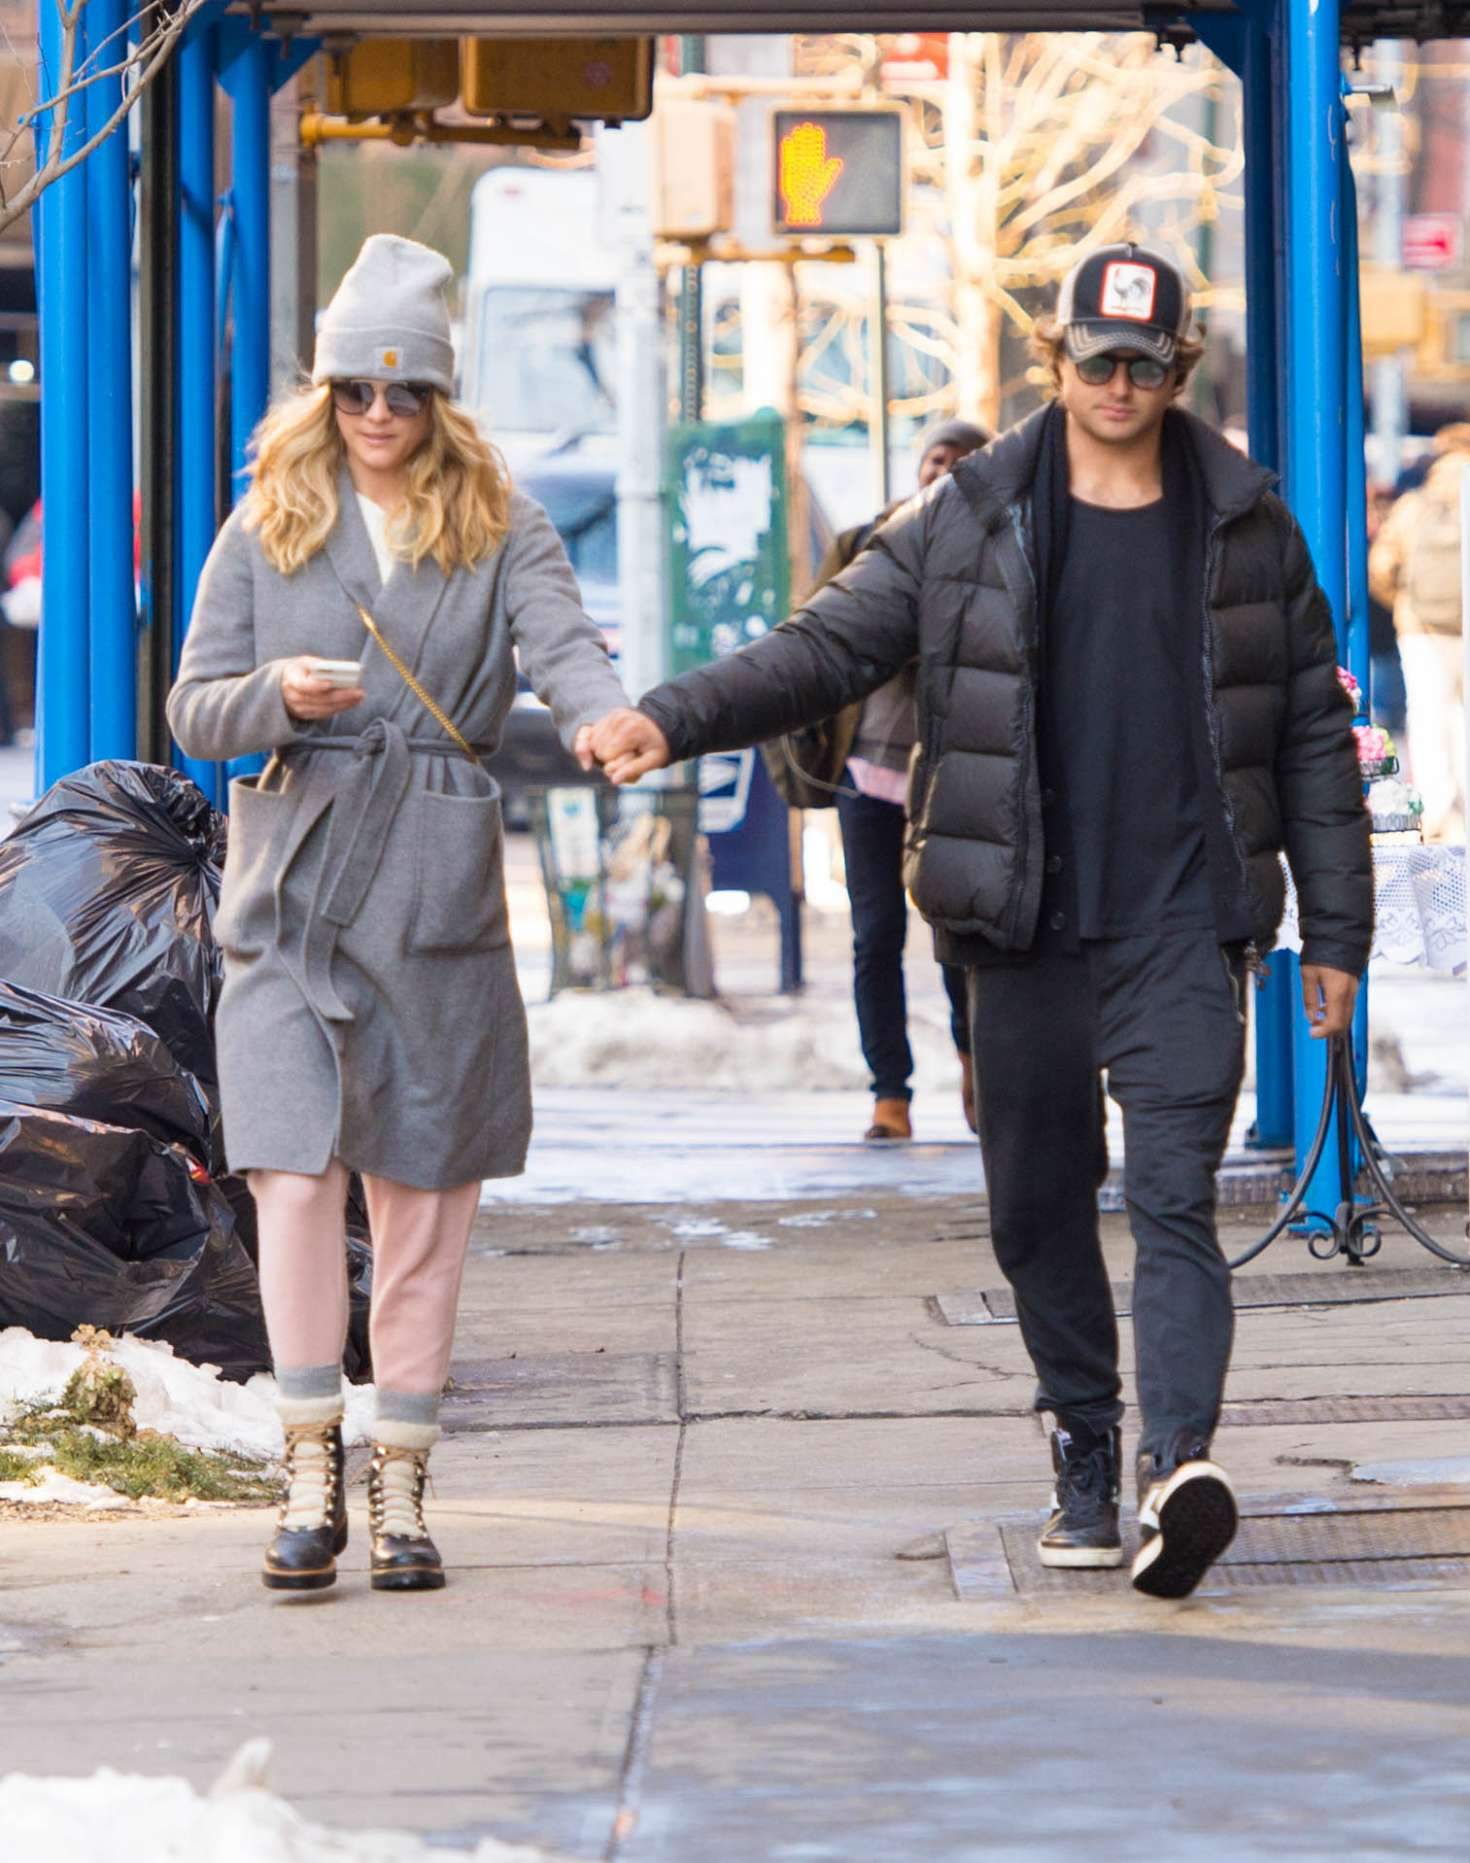 Nina Agdal 2018 : Nina Agdal: Shopping with boyfriend Jack Brinkley-Cook -06